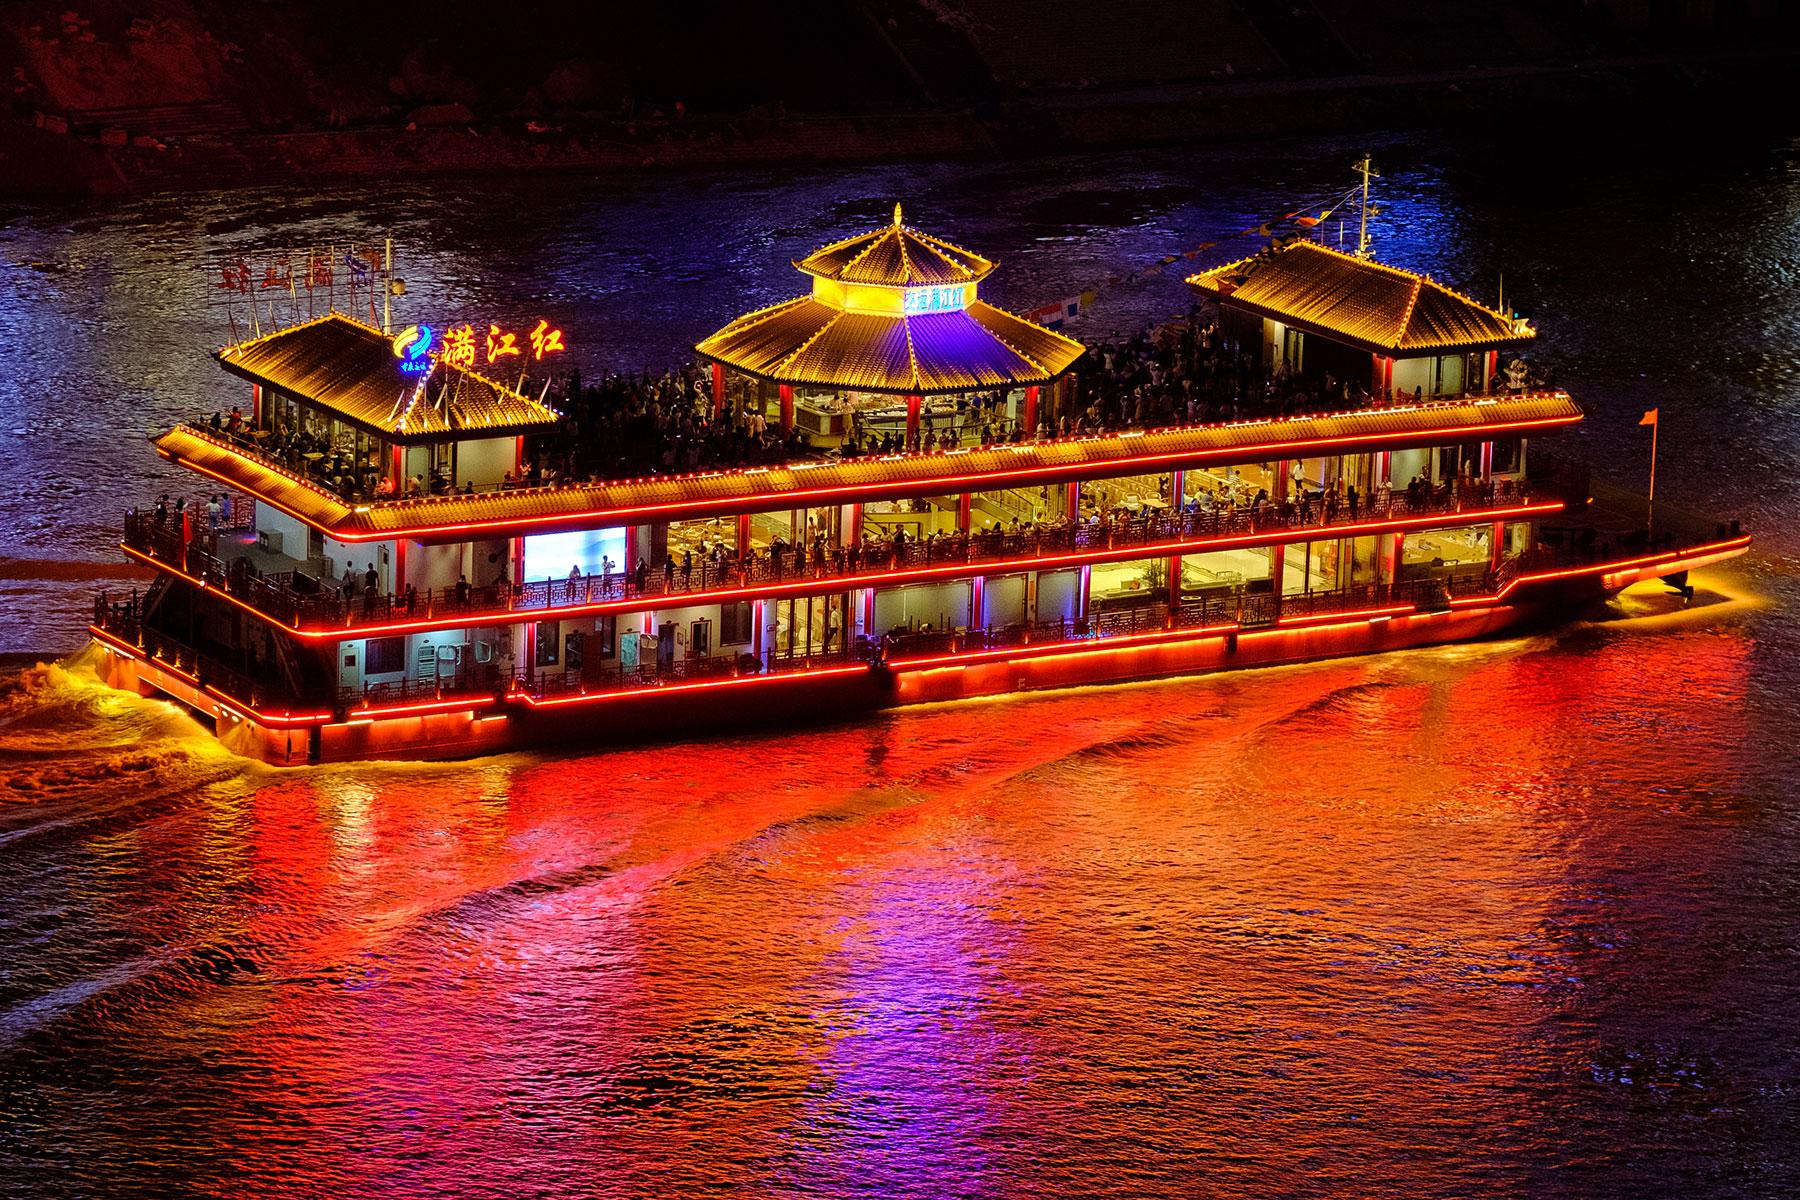 Beleuchtetes Boot auf Fluß bei Nacht in Chongqing